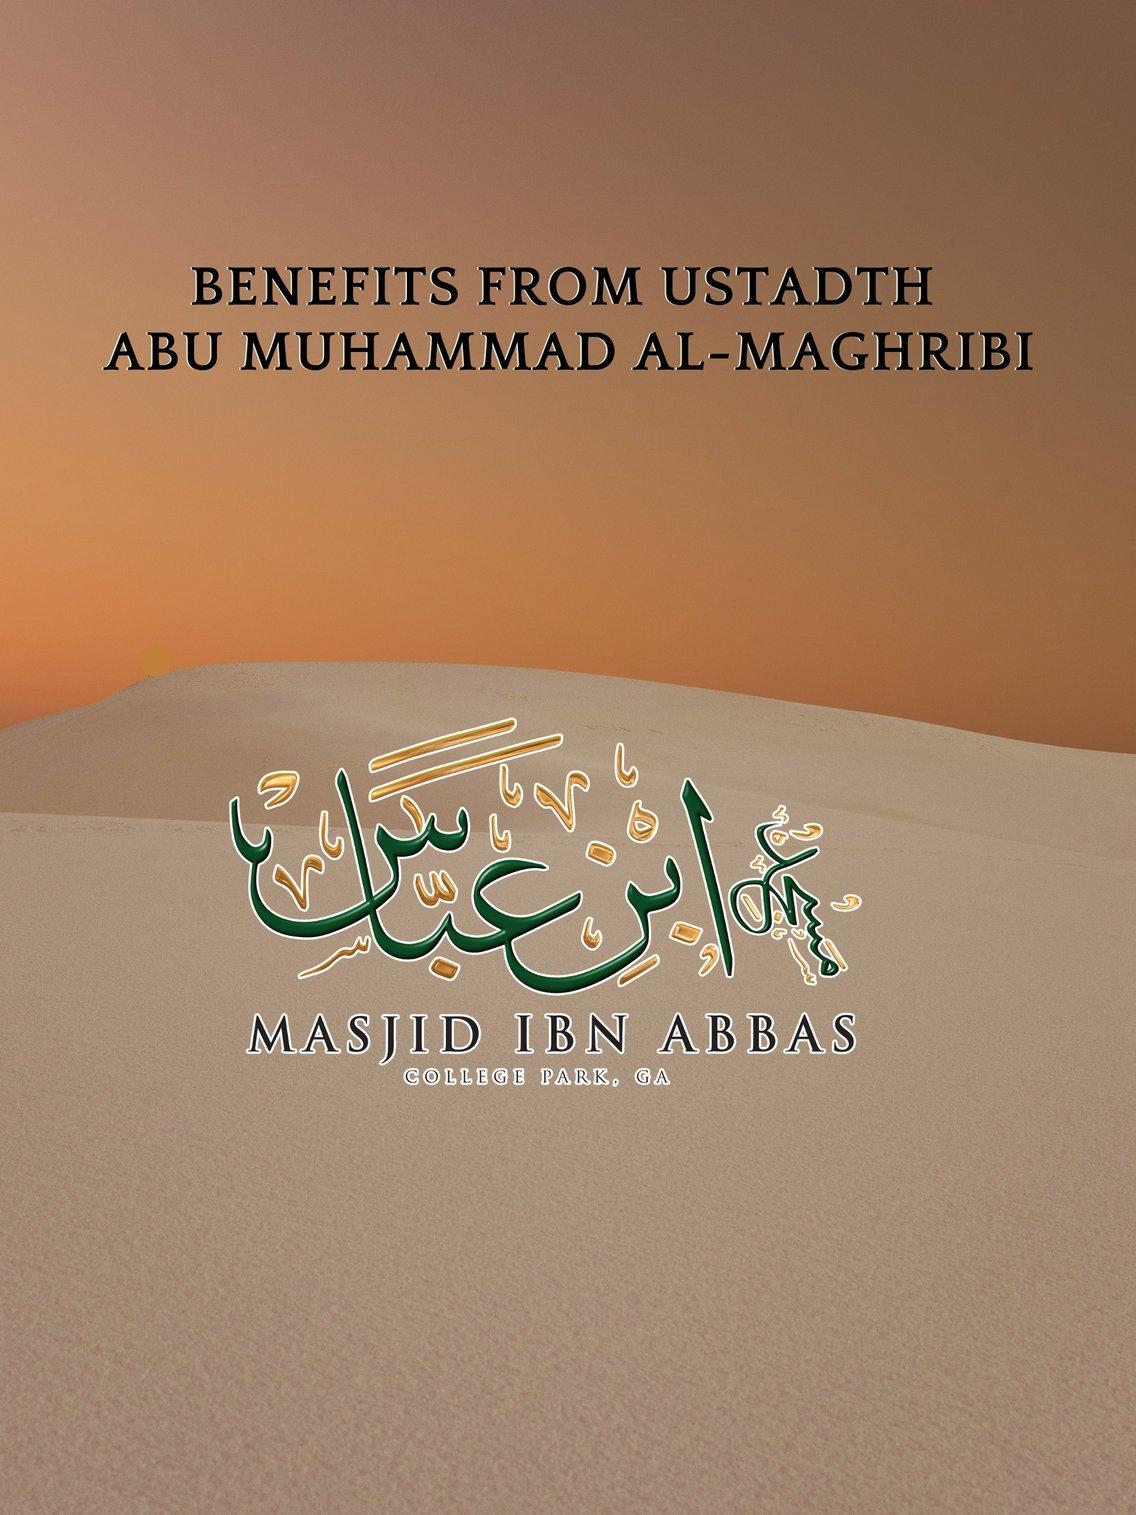 Benefits: Abu Muhammad Al-Maghribi - Cover Image